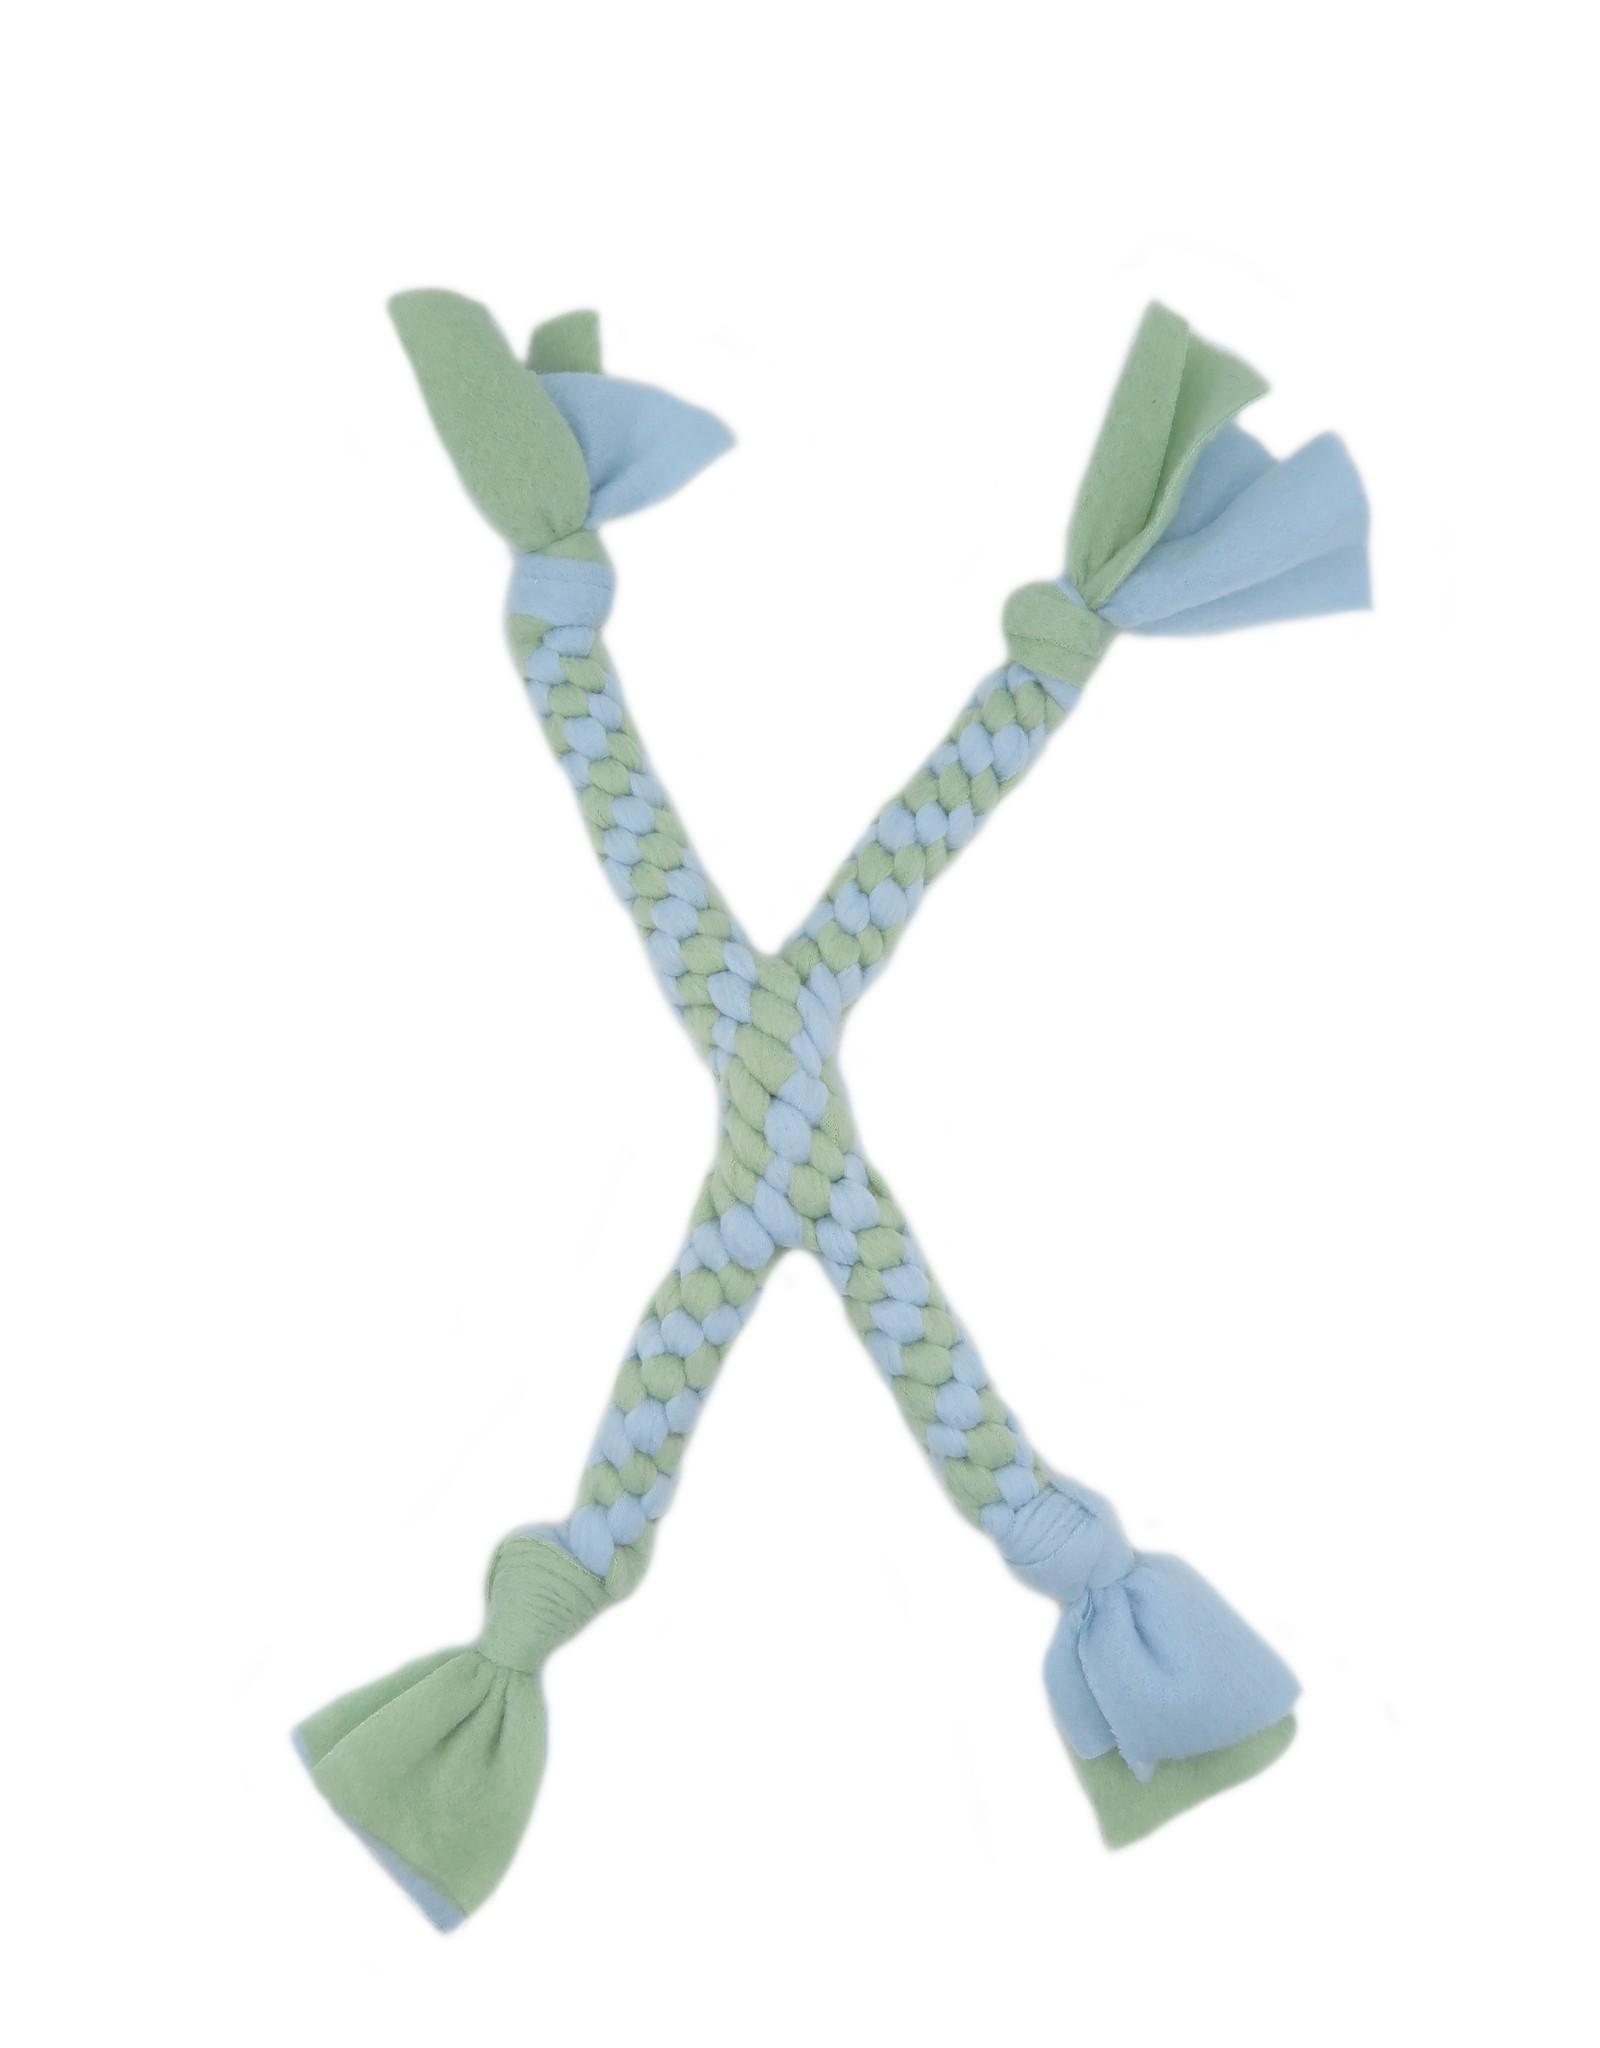 Fleece toy criss cross